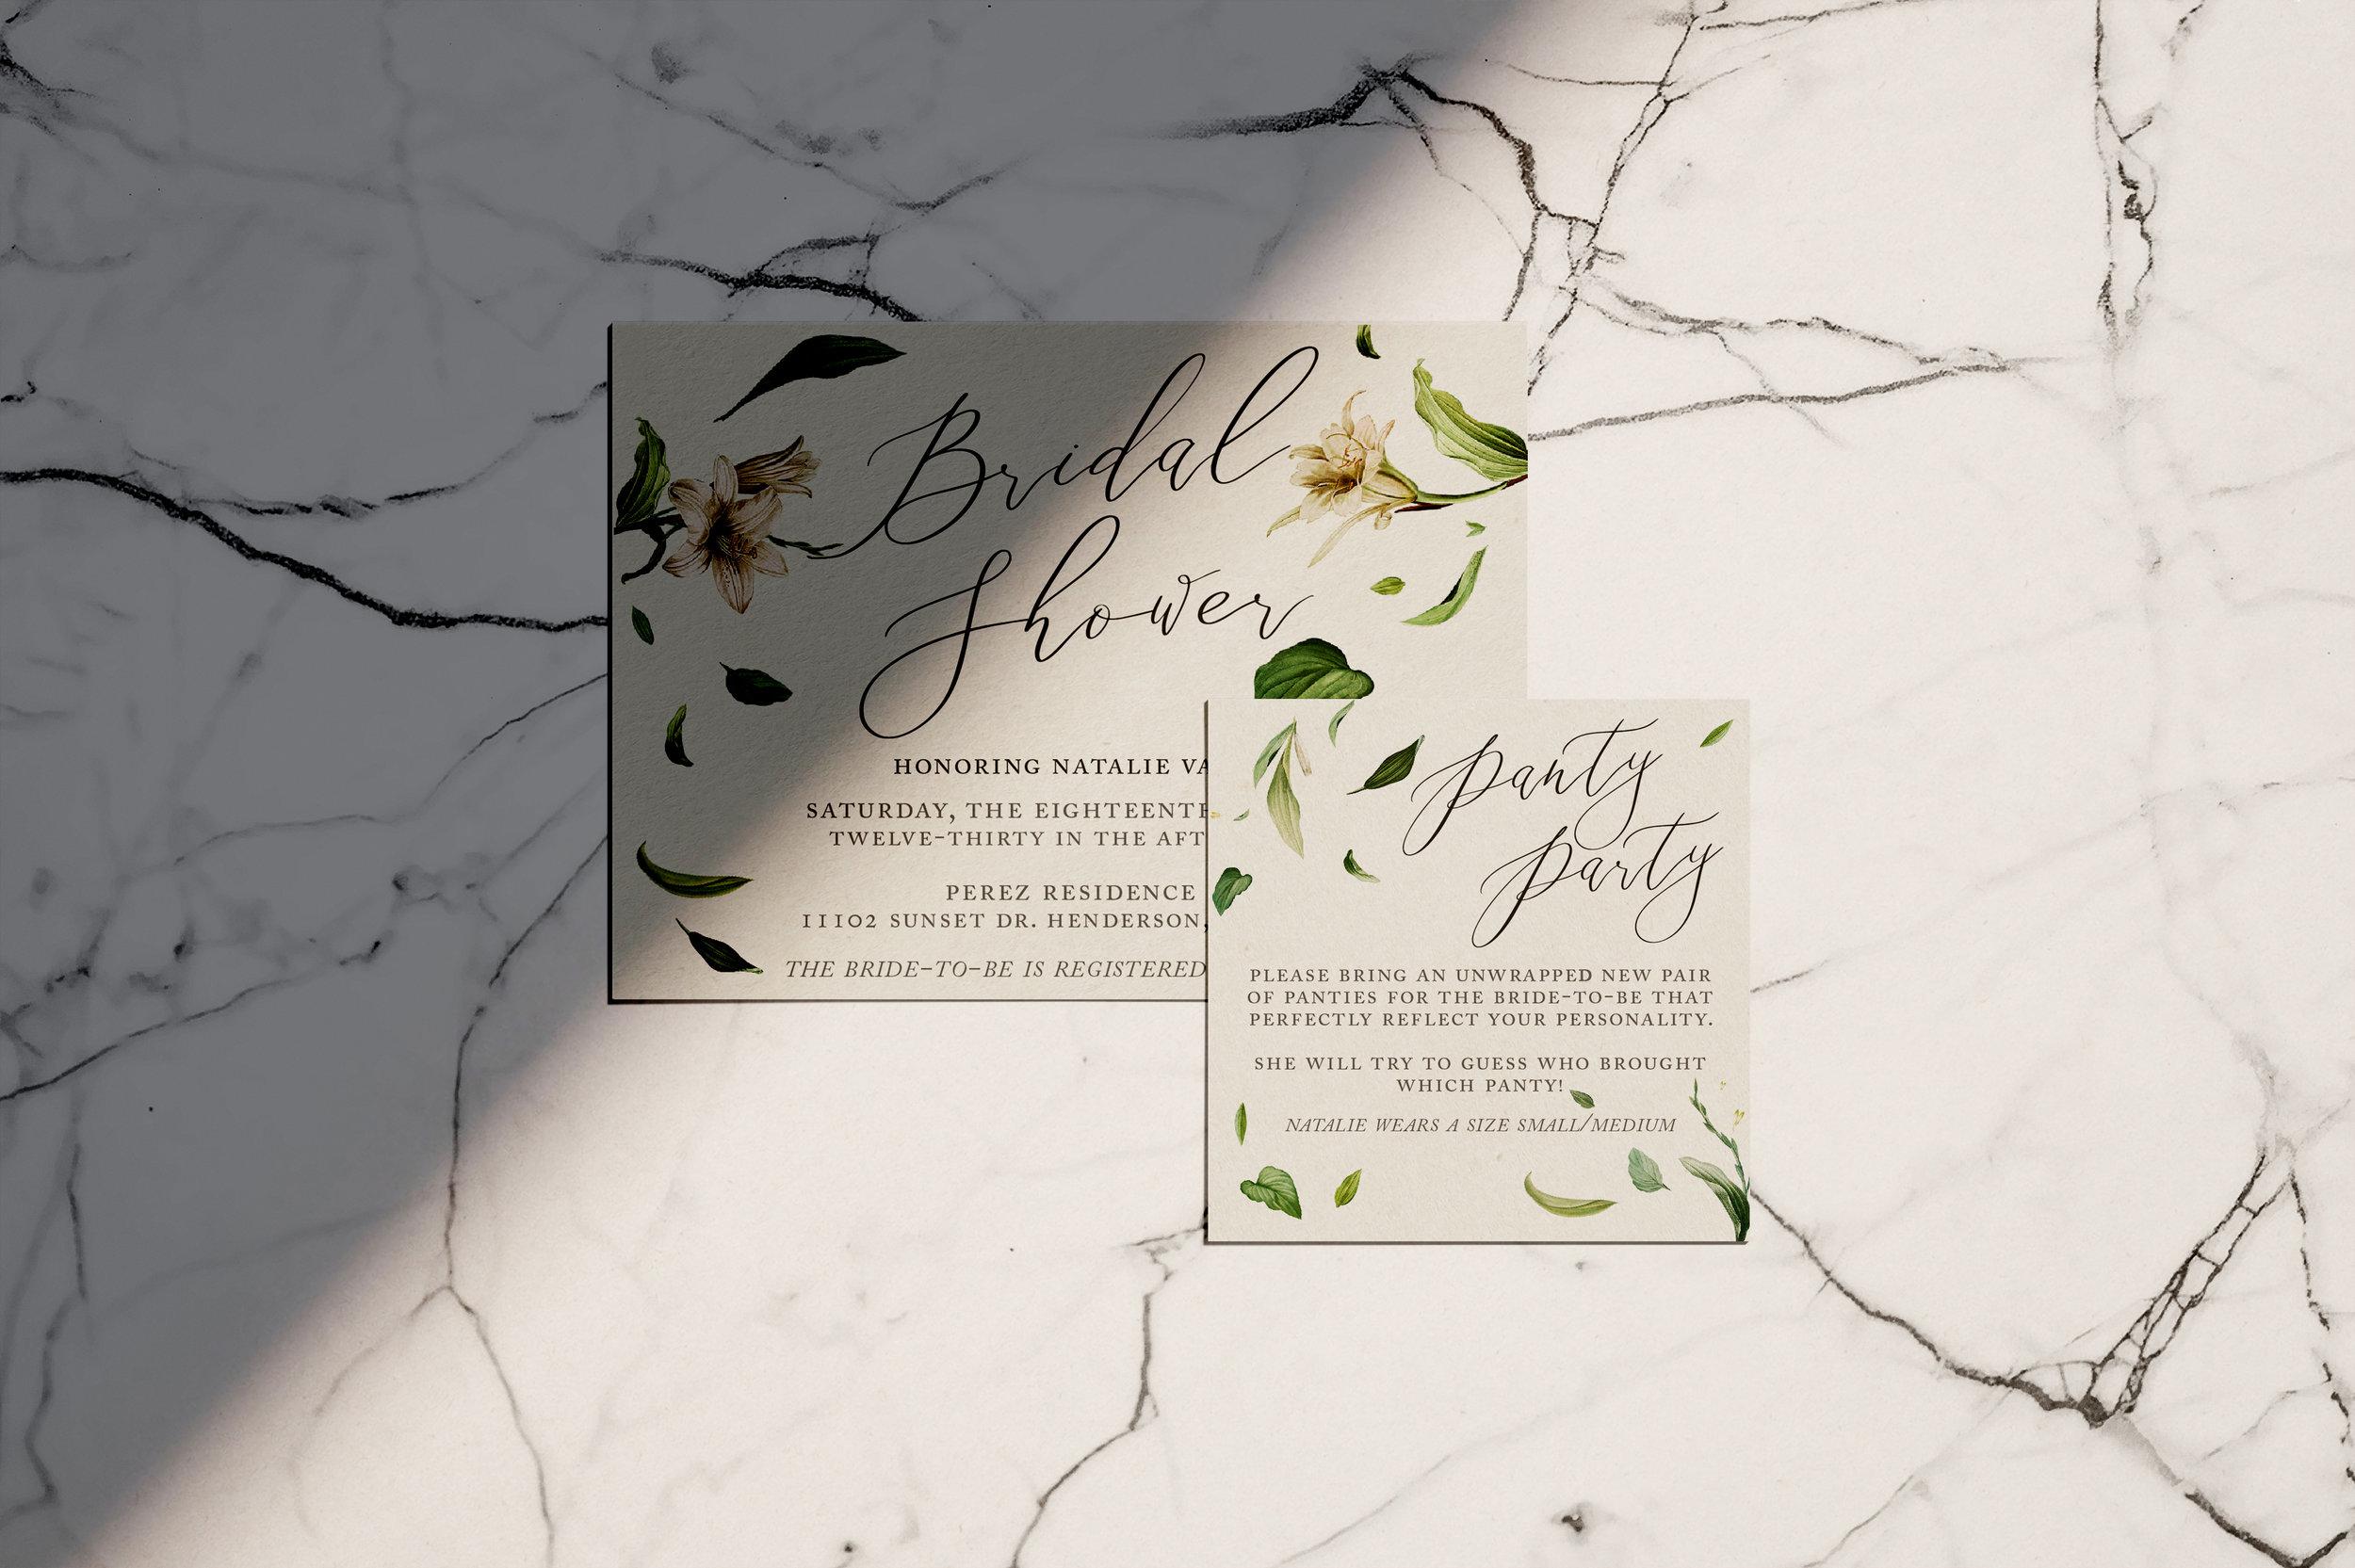 Natalie Bridal Shower.jpg